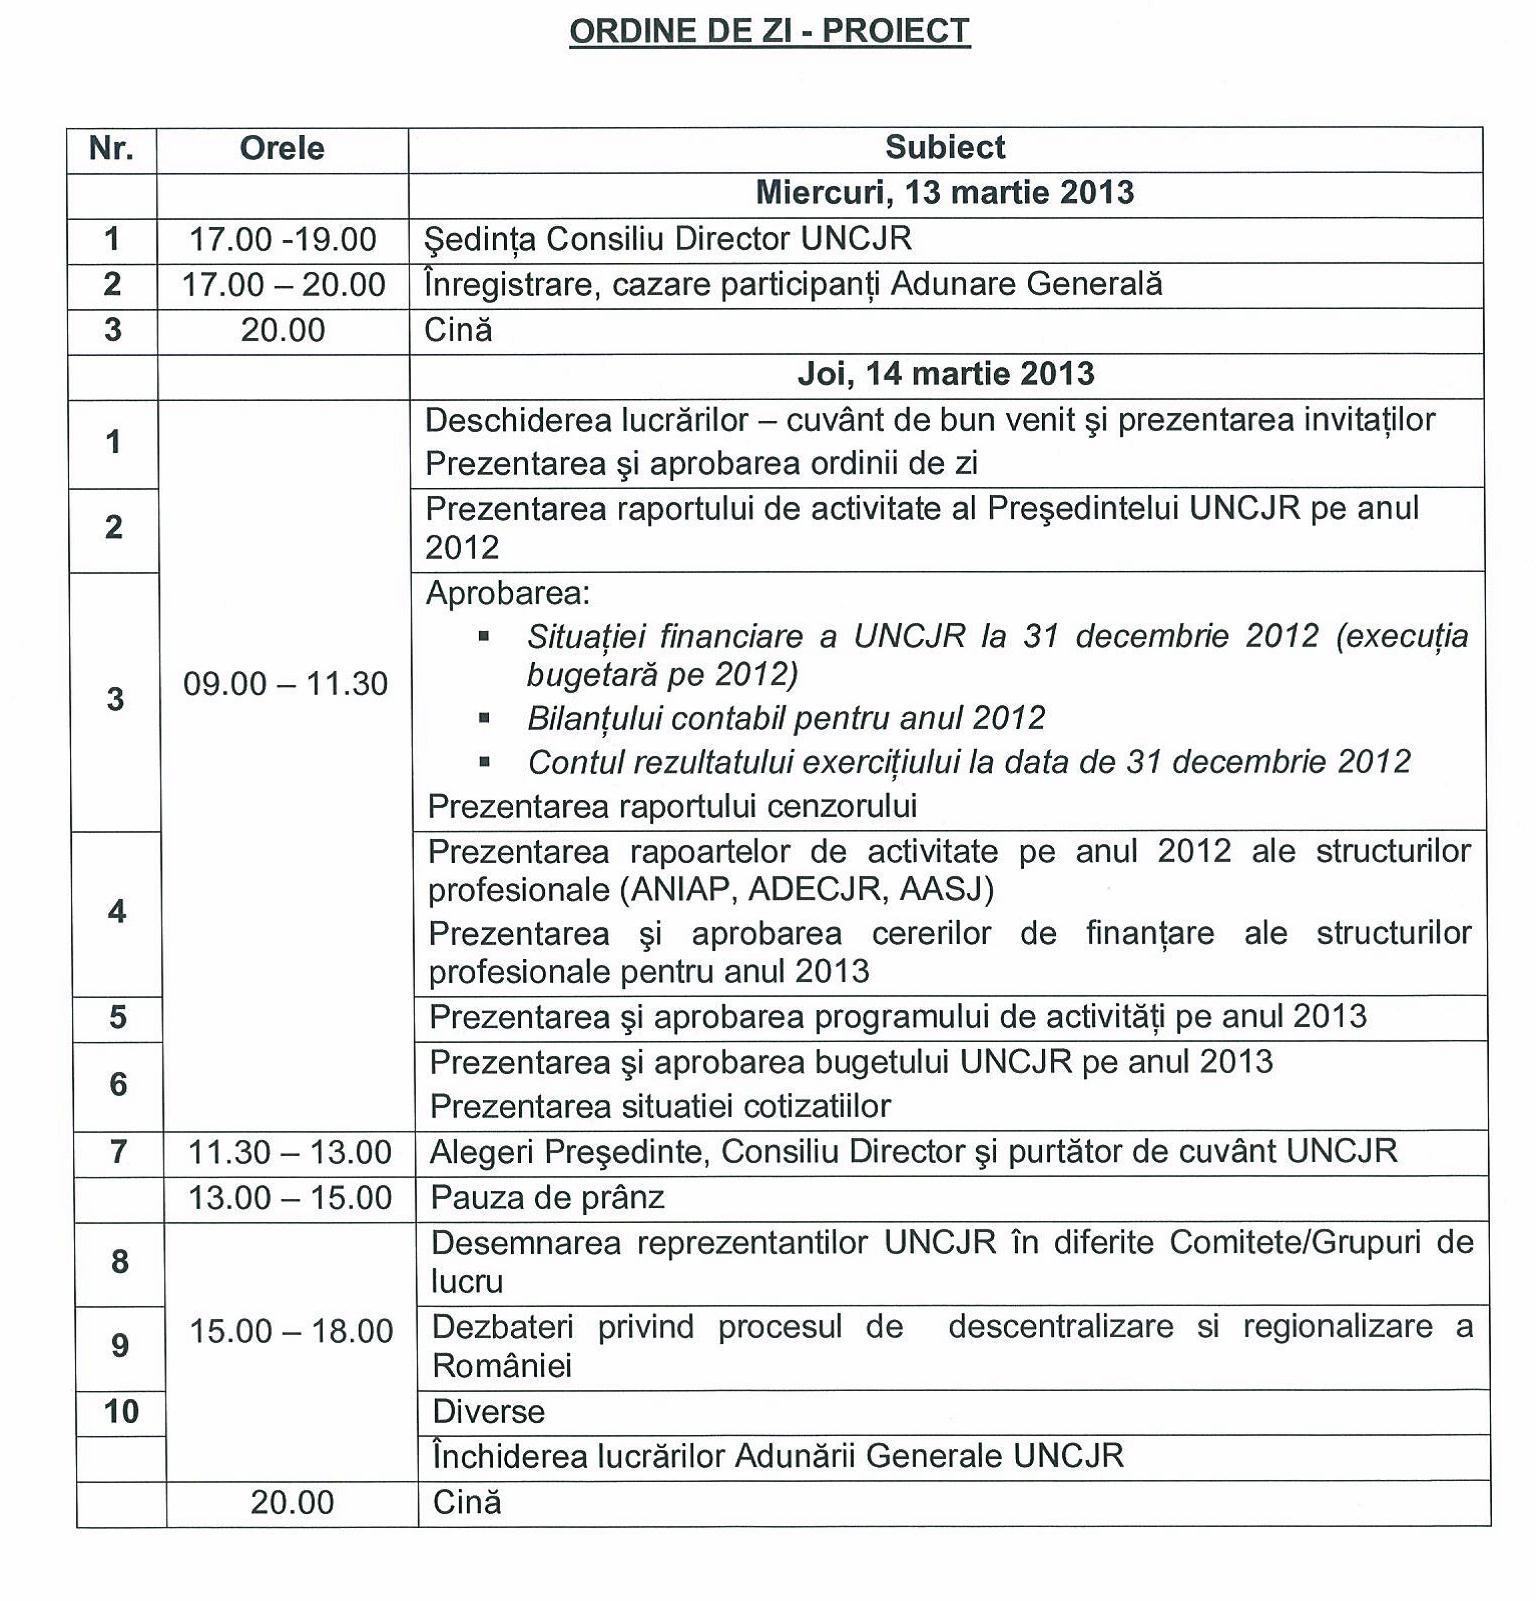 Agenda de lucru a Adunarii Generale a UNCJR